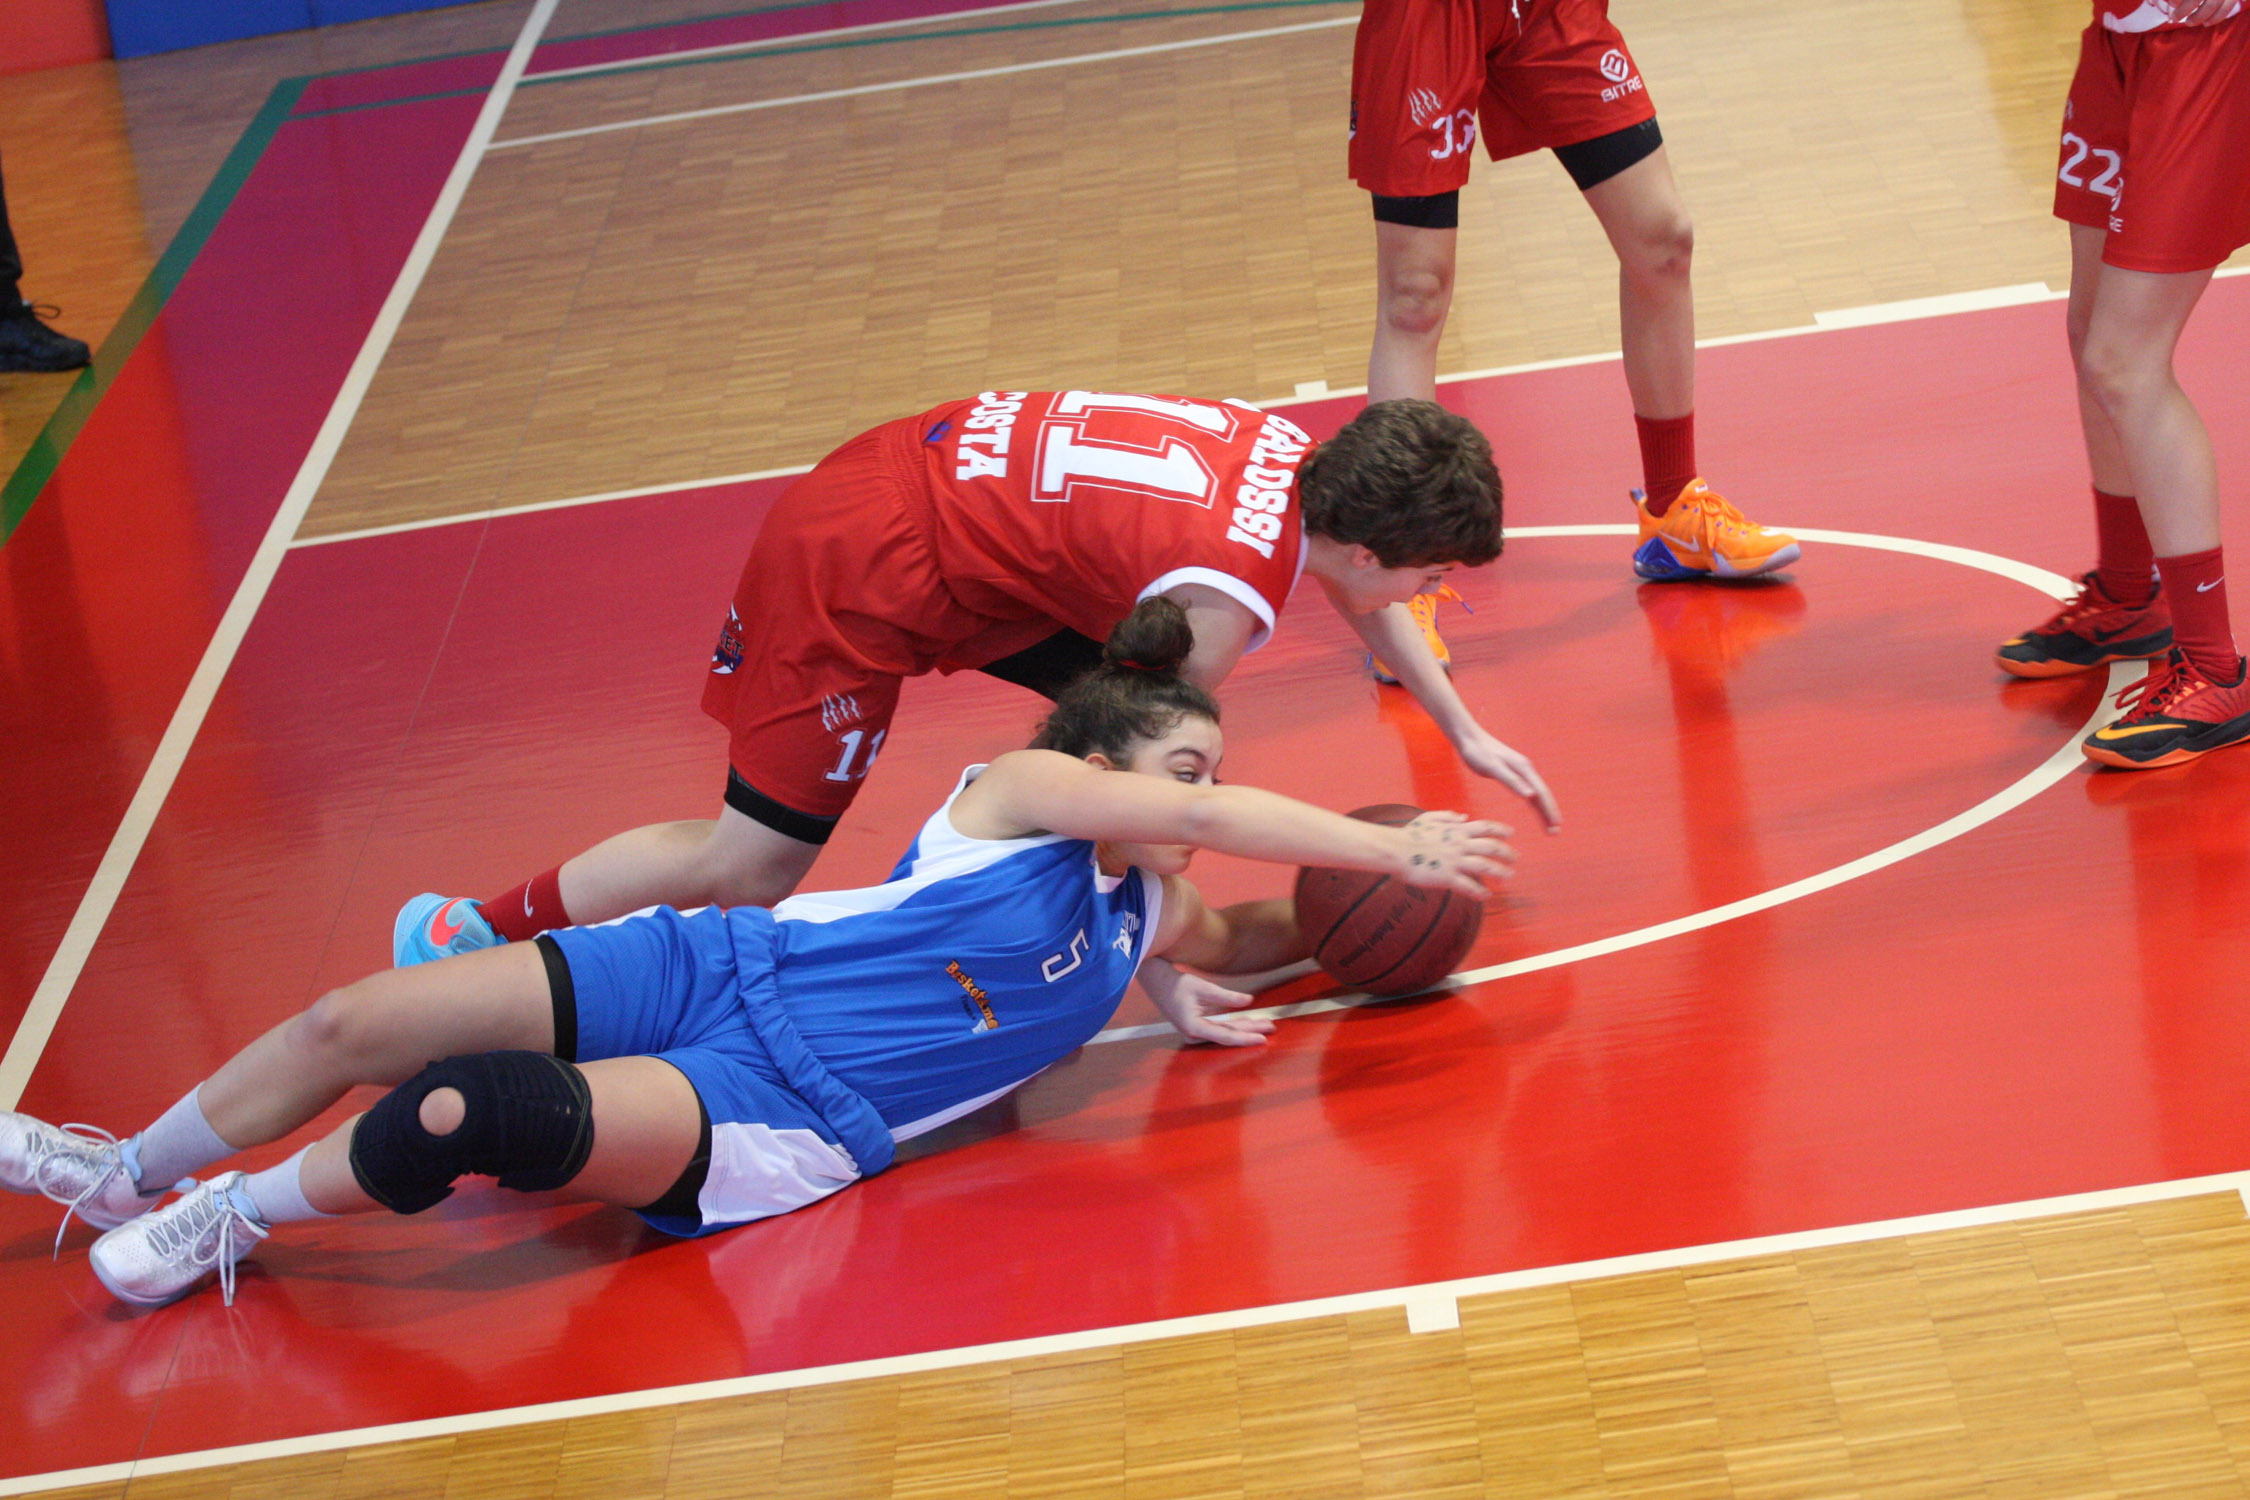 U16E - Costa Masnaga vs Baskettiamo Vittuone 2001 00007.jpg